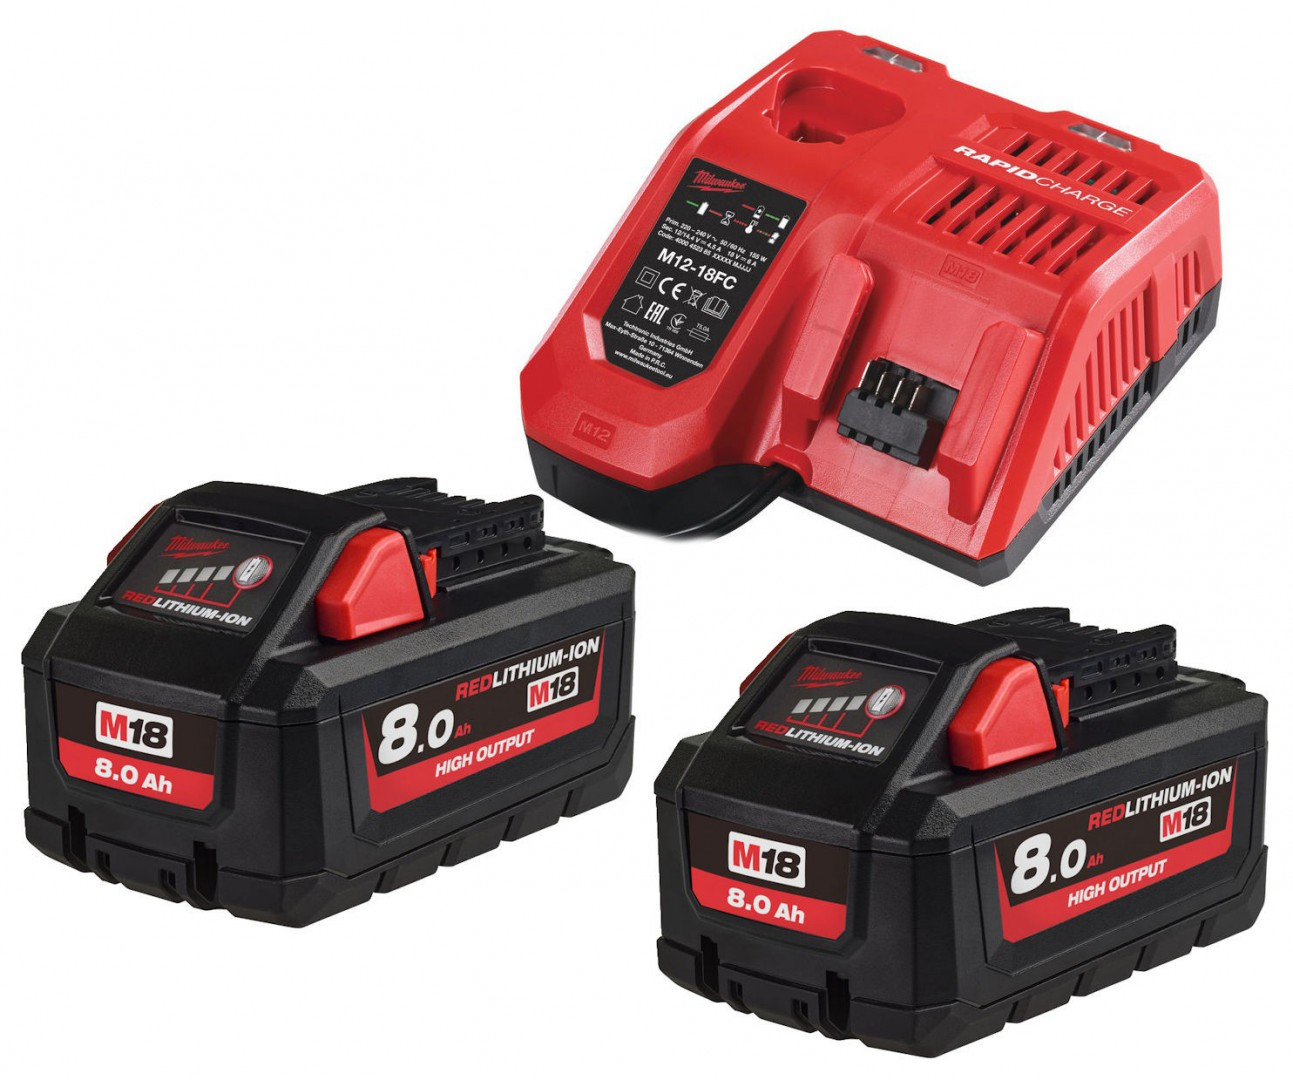 Zestaw akumulatorów 2 x M18 8.0 Ah + ładowarka NRG802 MILWAUKEE